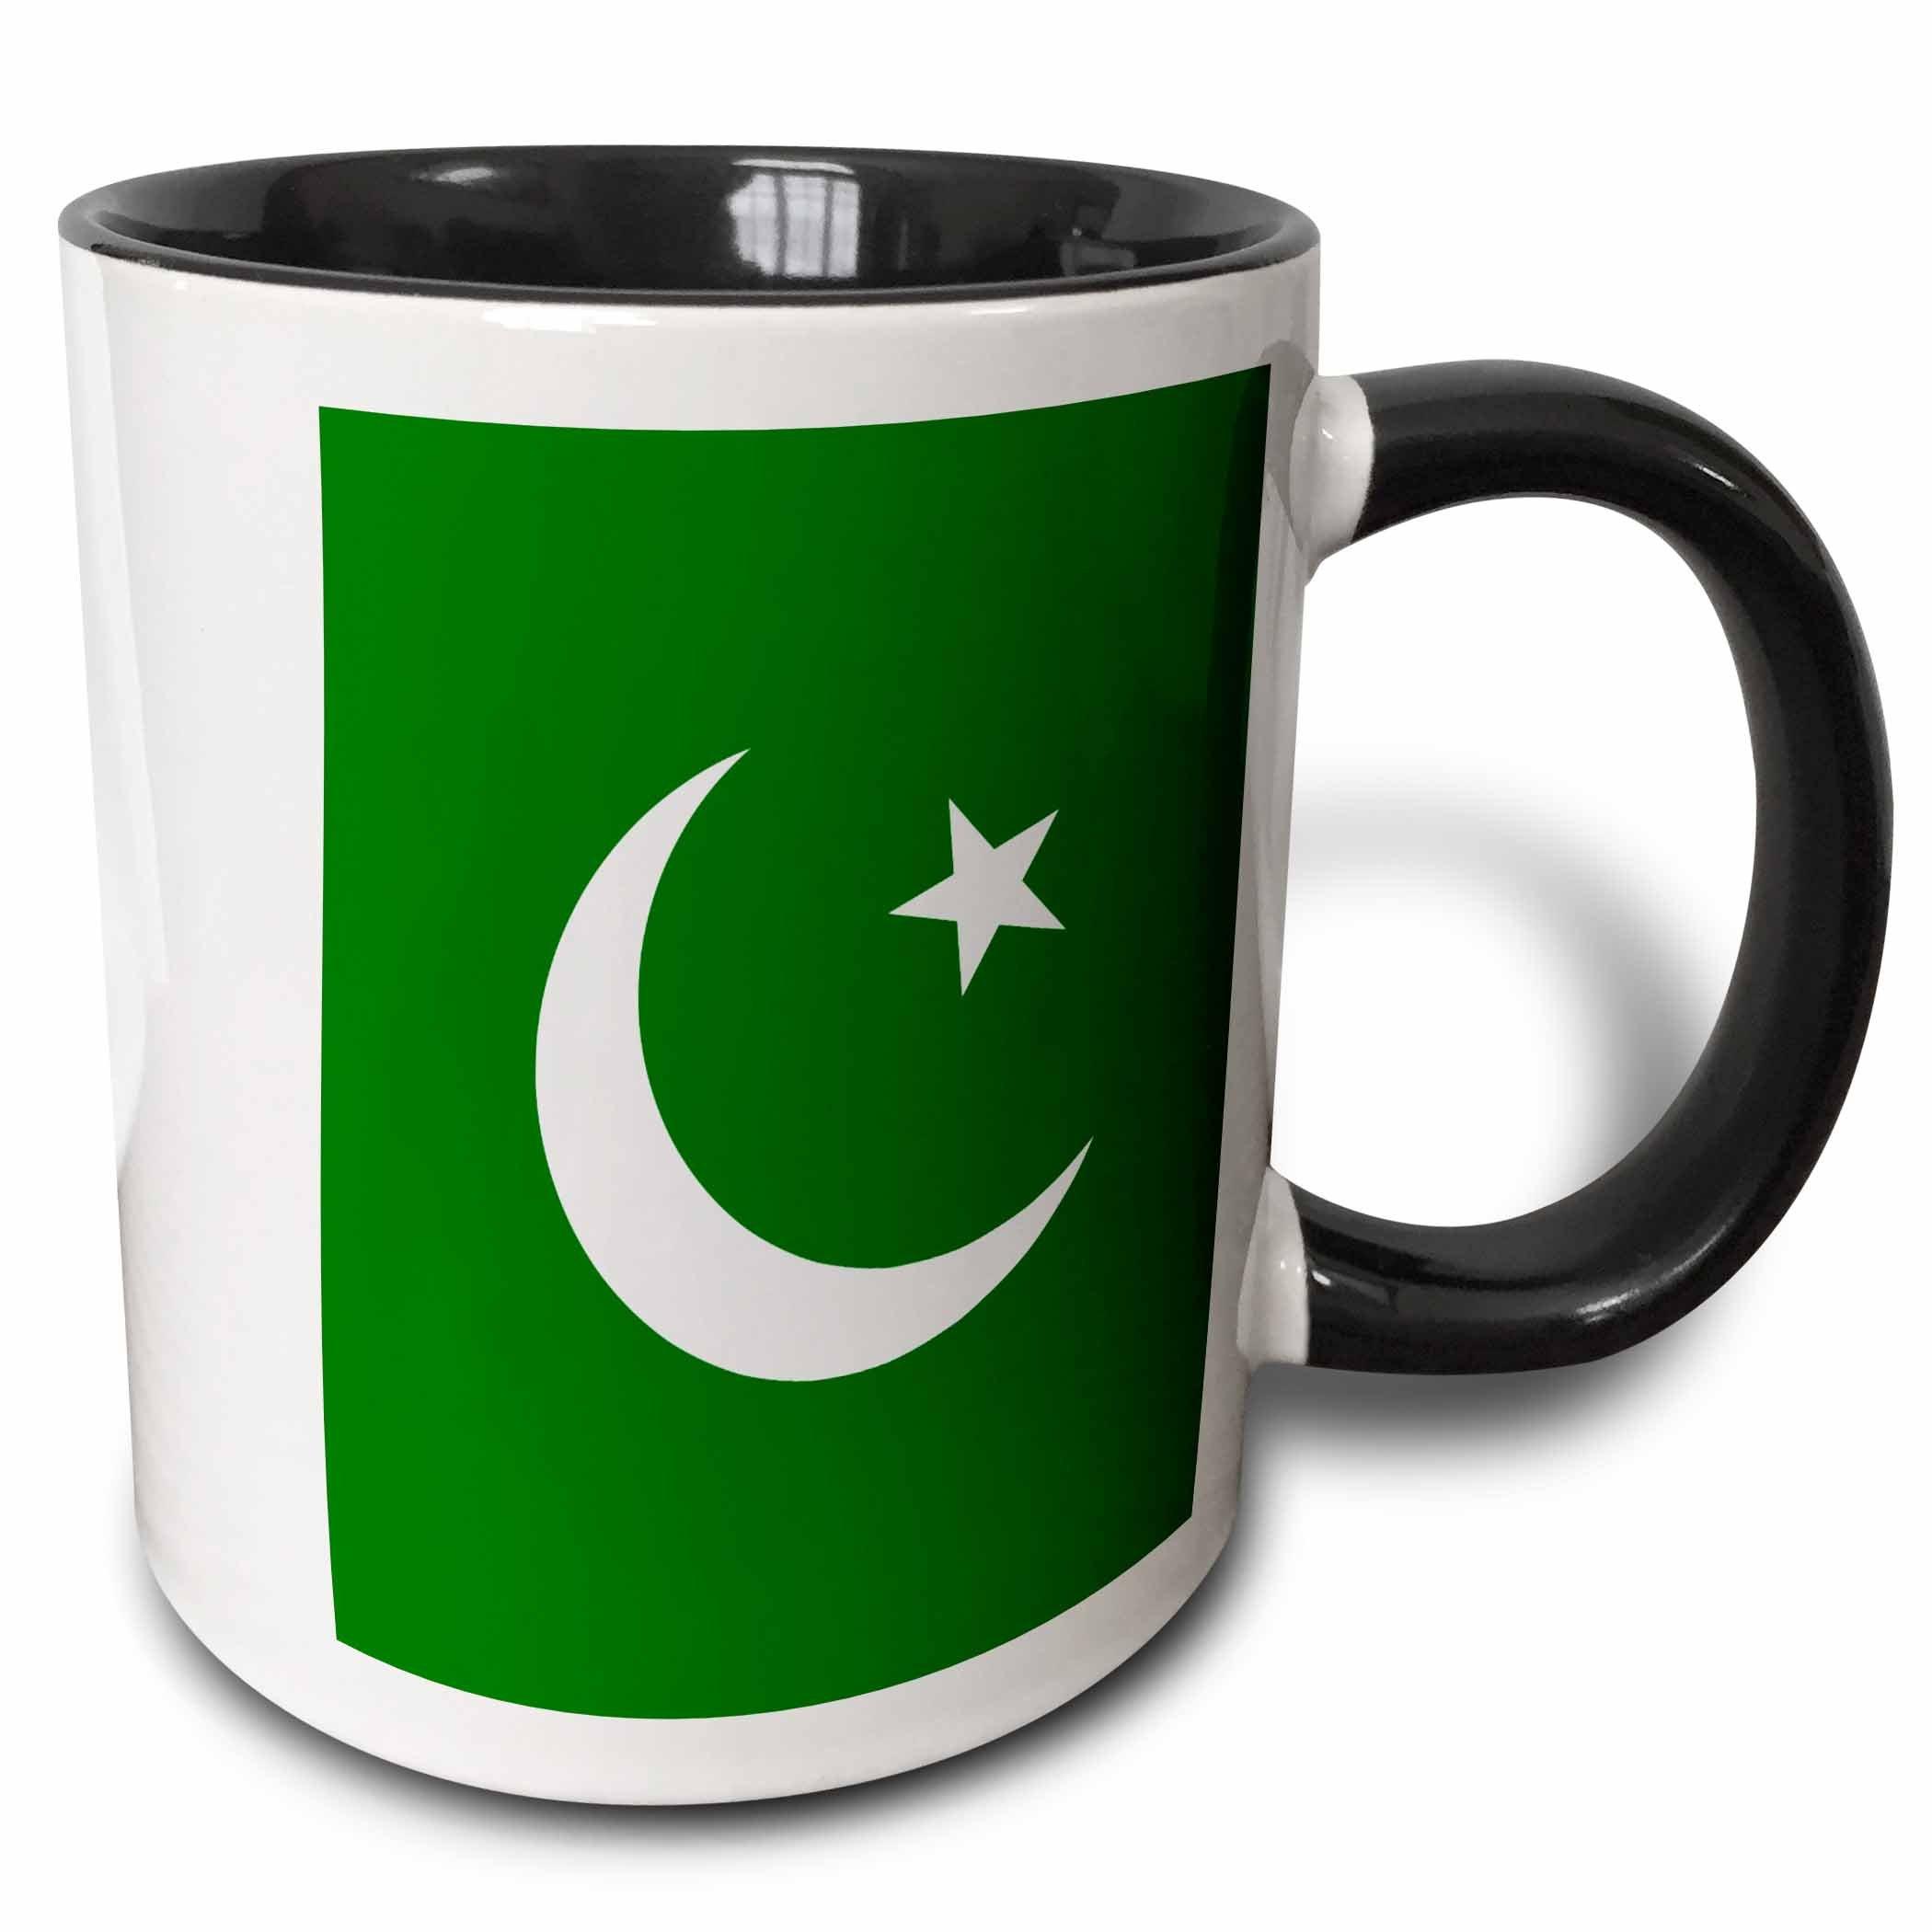 3dRose (mug_158405_4) Flag of Pakistan - Pakistani dark green with white crescent moon and star Islamic country Asia world - Two Tone Black Mug, 11oz